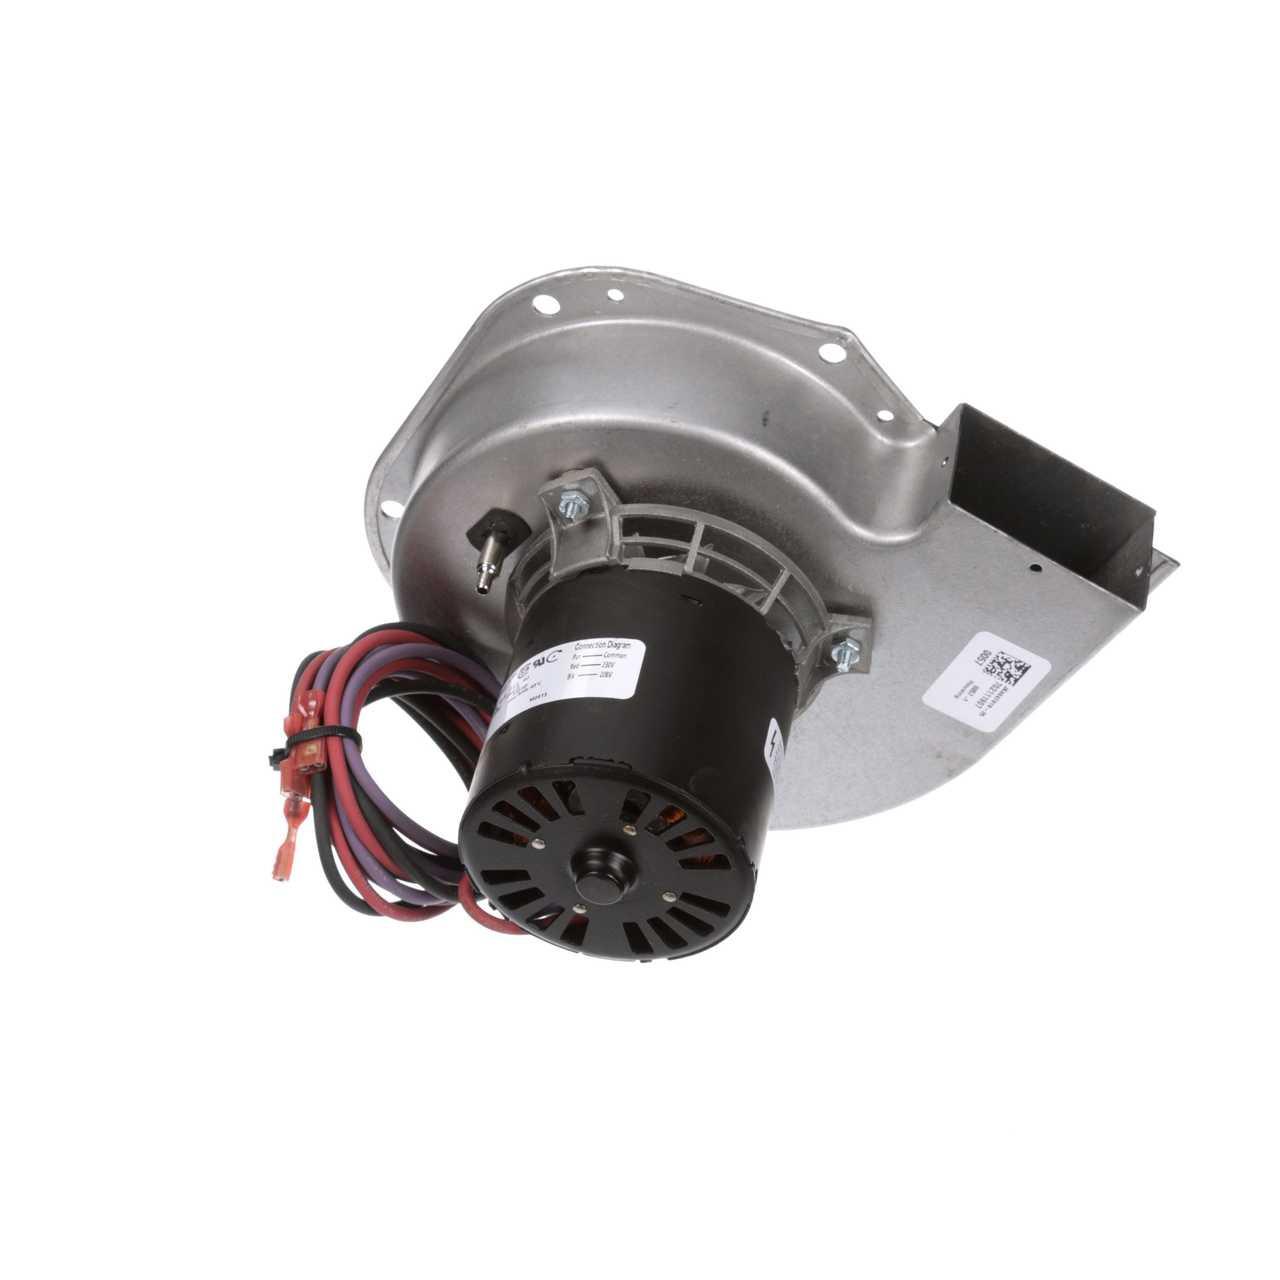 Goodman Furnace Draft Inducer Blower 230v  7021